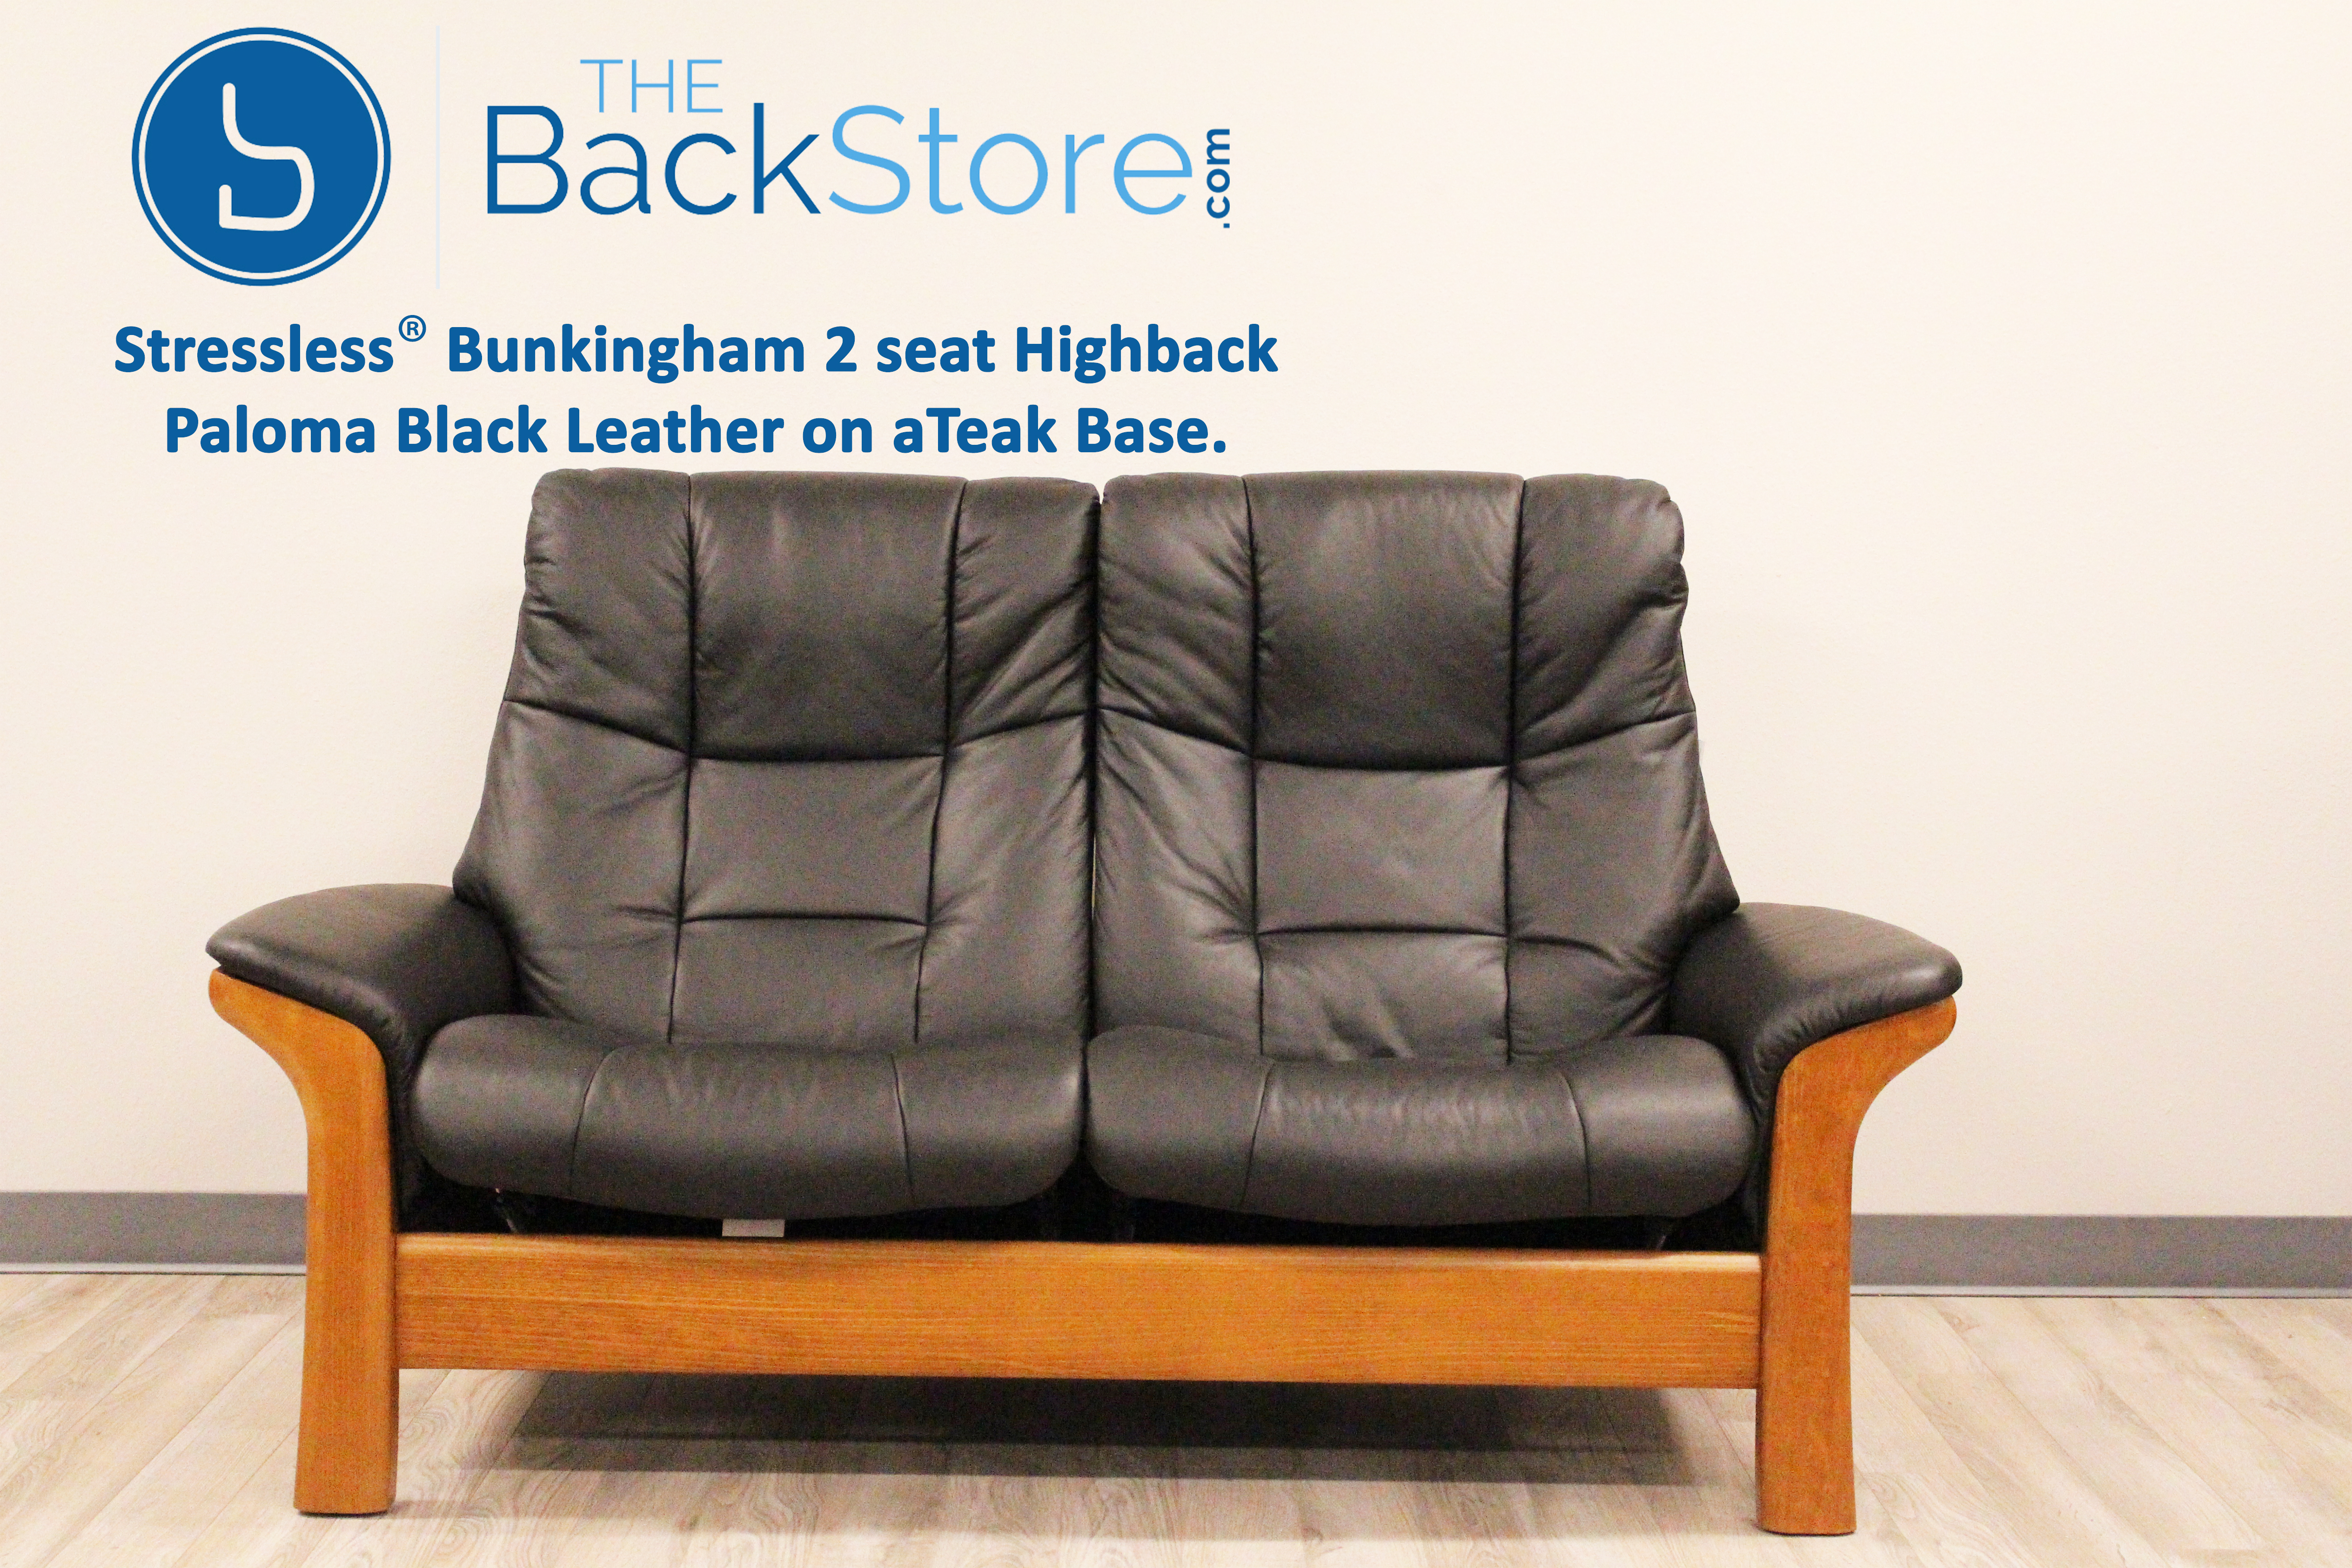 Stressless Buckingham 2 Seat Loveseat High Back Sofa Paloma Black